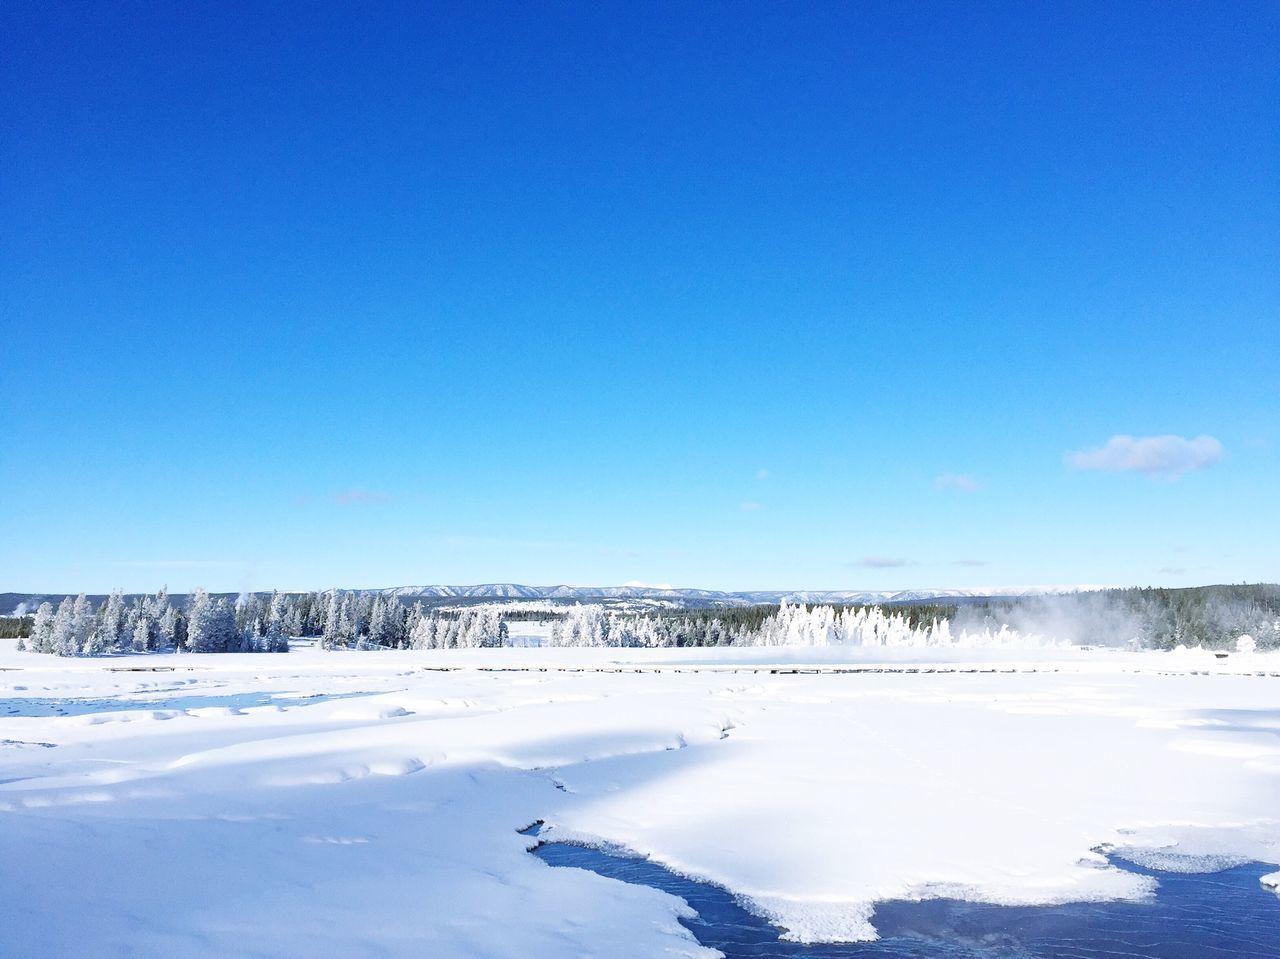 Idyllic Shot Of Frozen Lake Against Sky